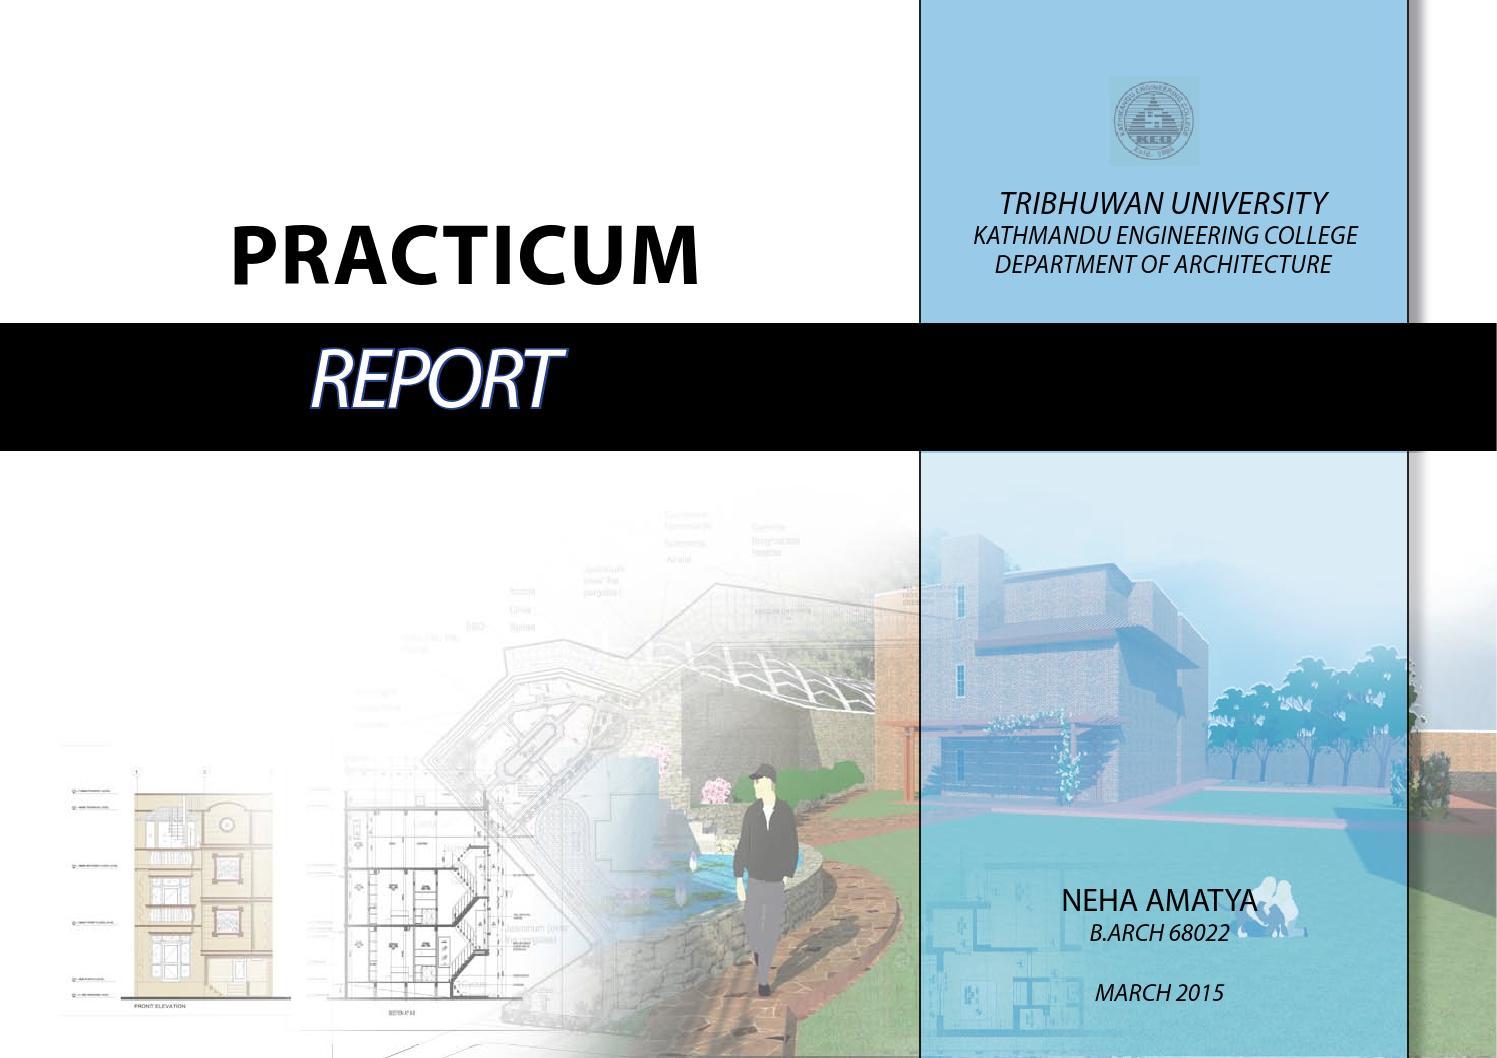 practicum report sample for hotel and restaurant management